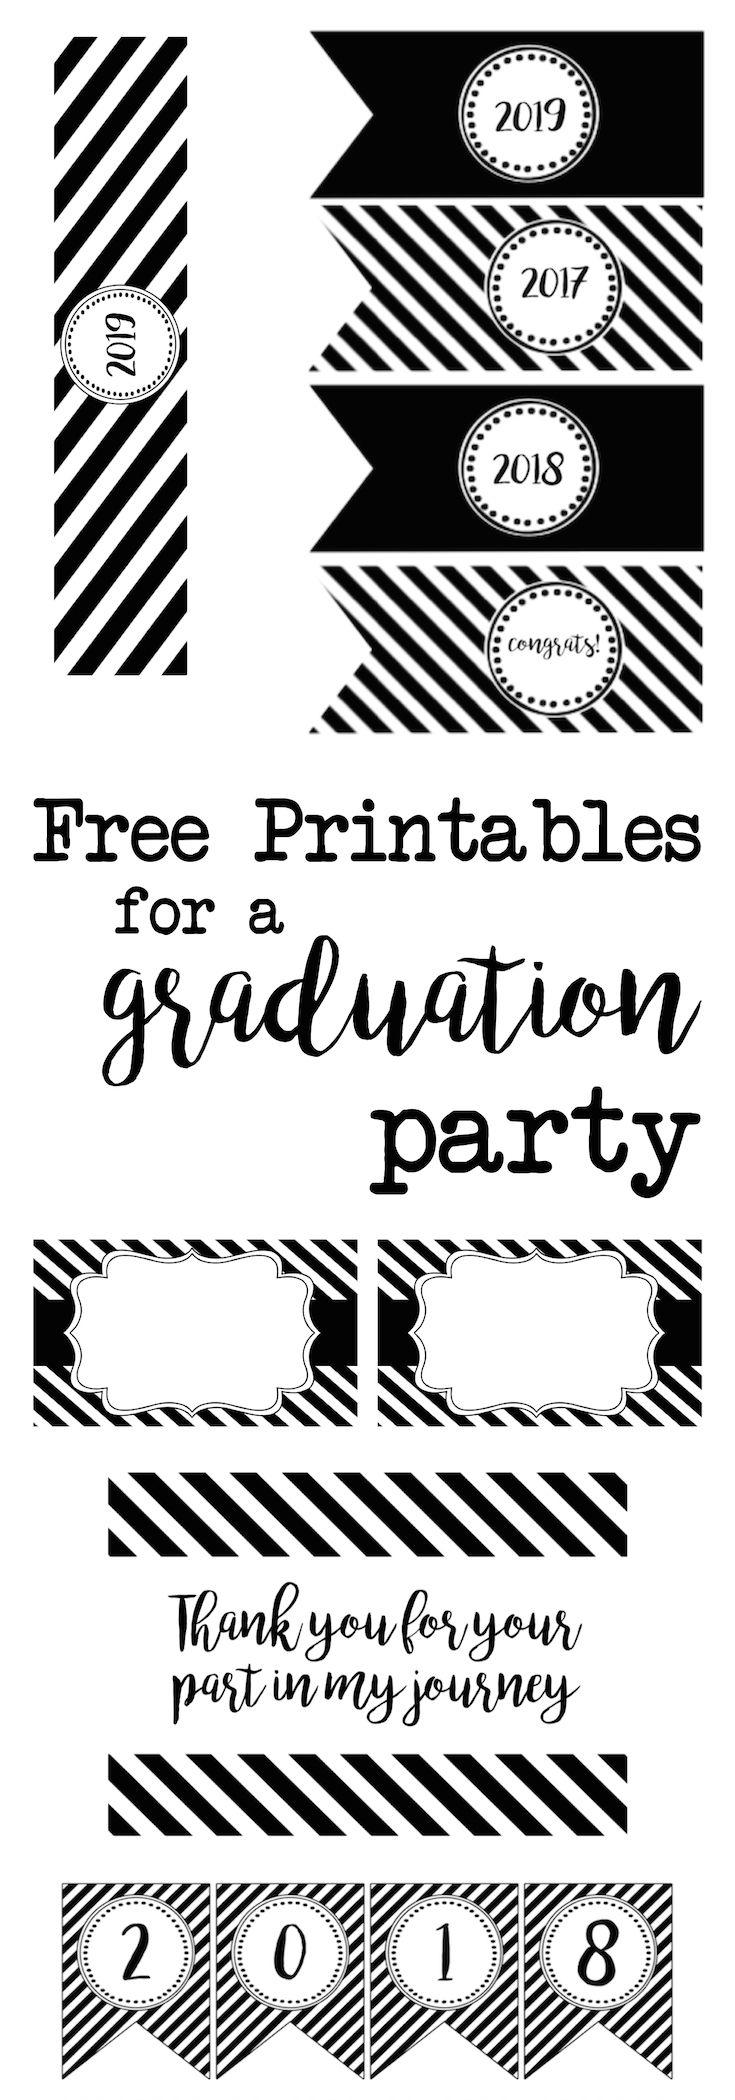 20 Graduation Printables | Free printables, Grad parties and Free